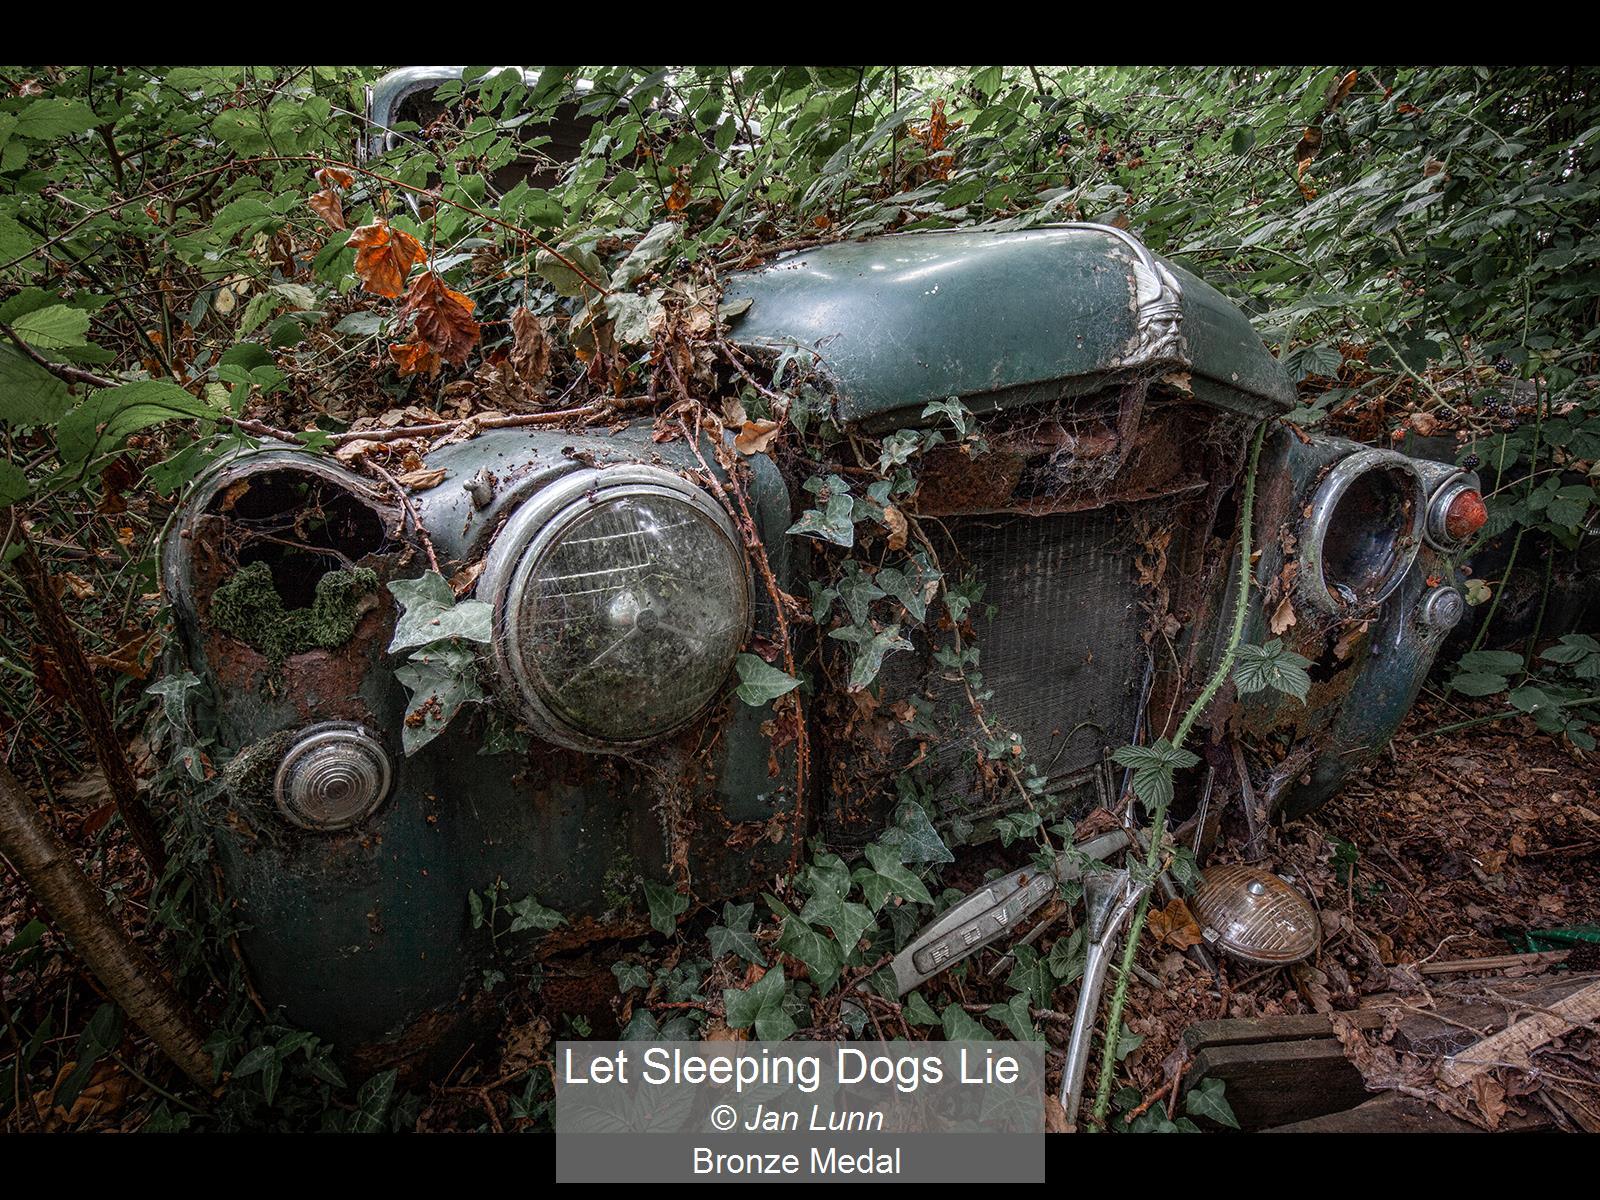 Let Sleeping Dogs Lie_Jan Lunn_Bronze